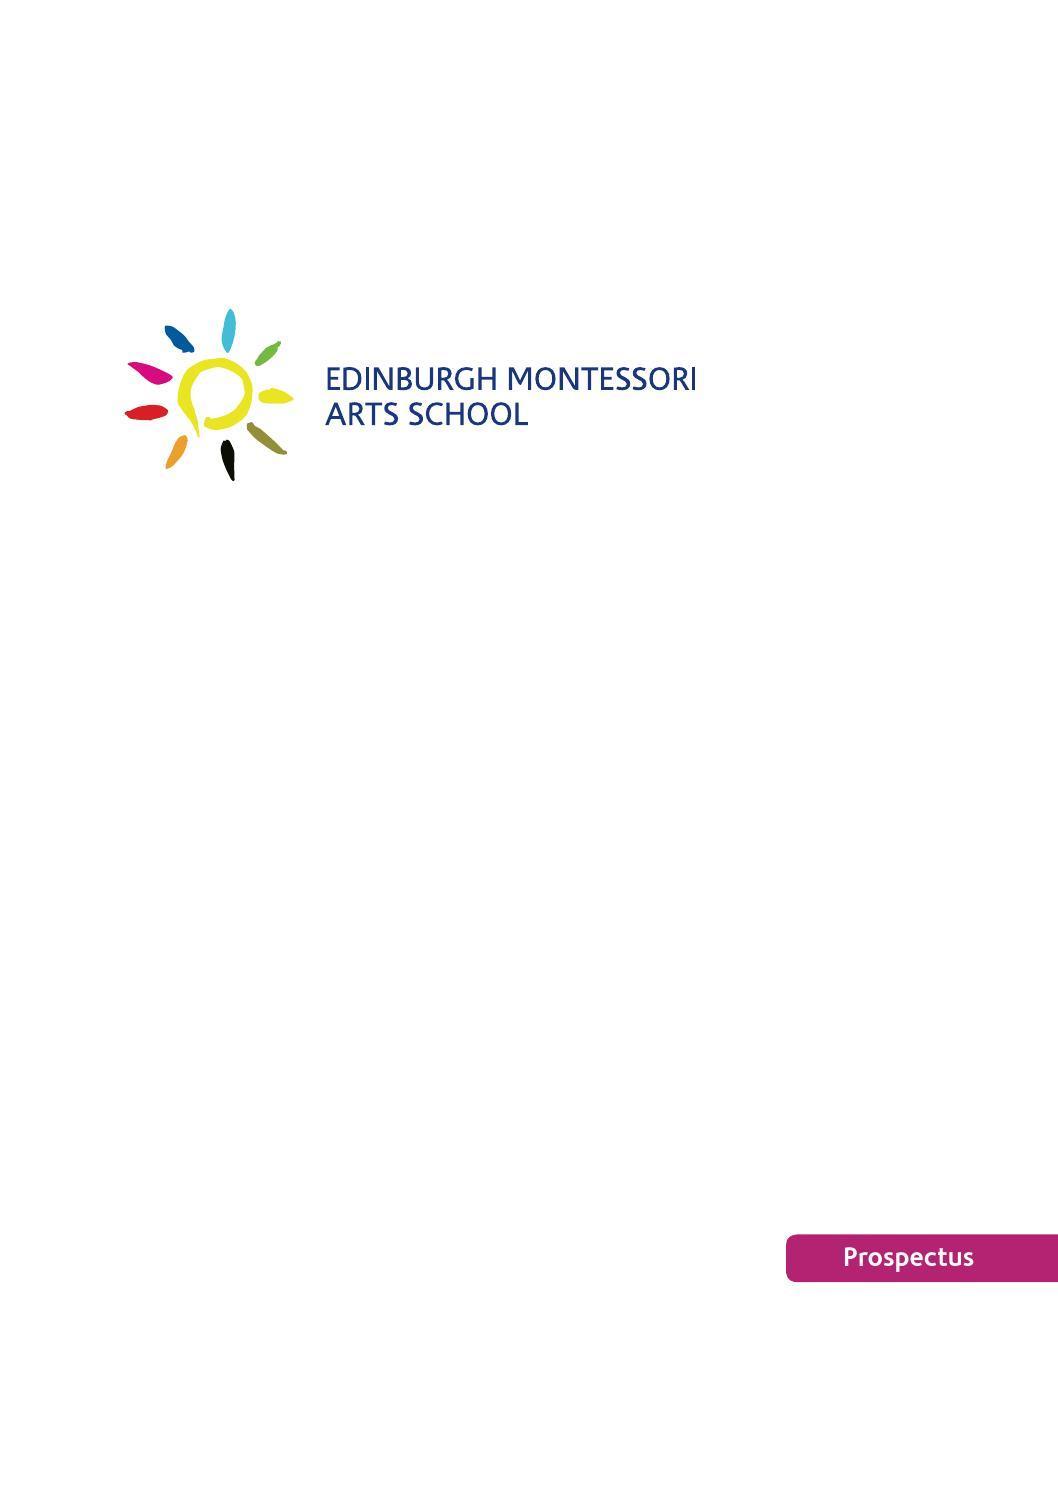 The Edinburgh Montessori Arts School Prospectus By Issuu